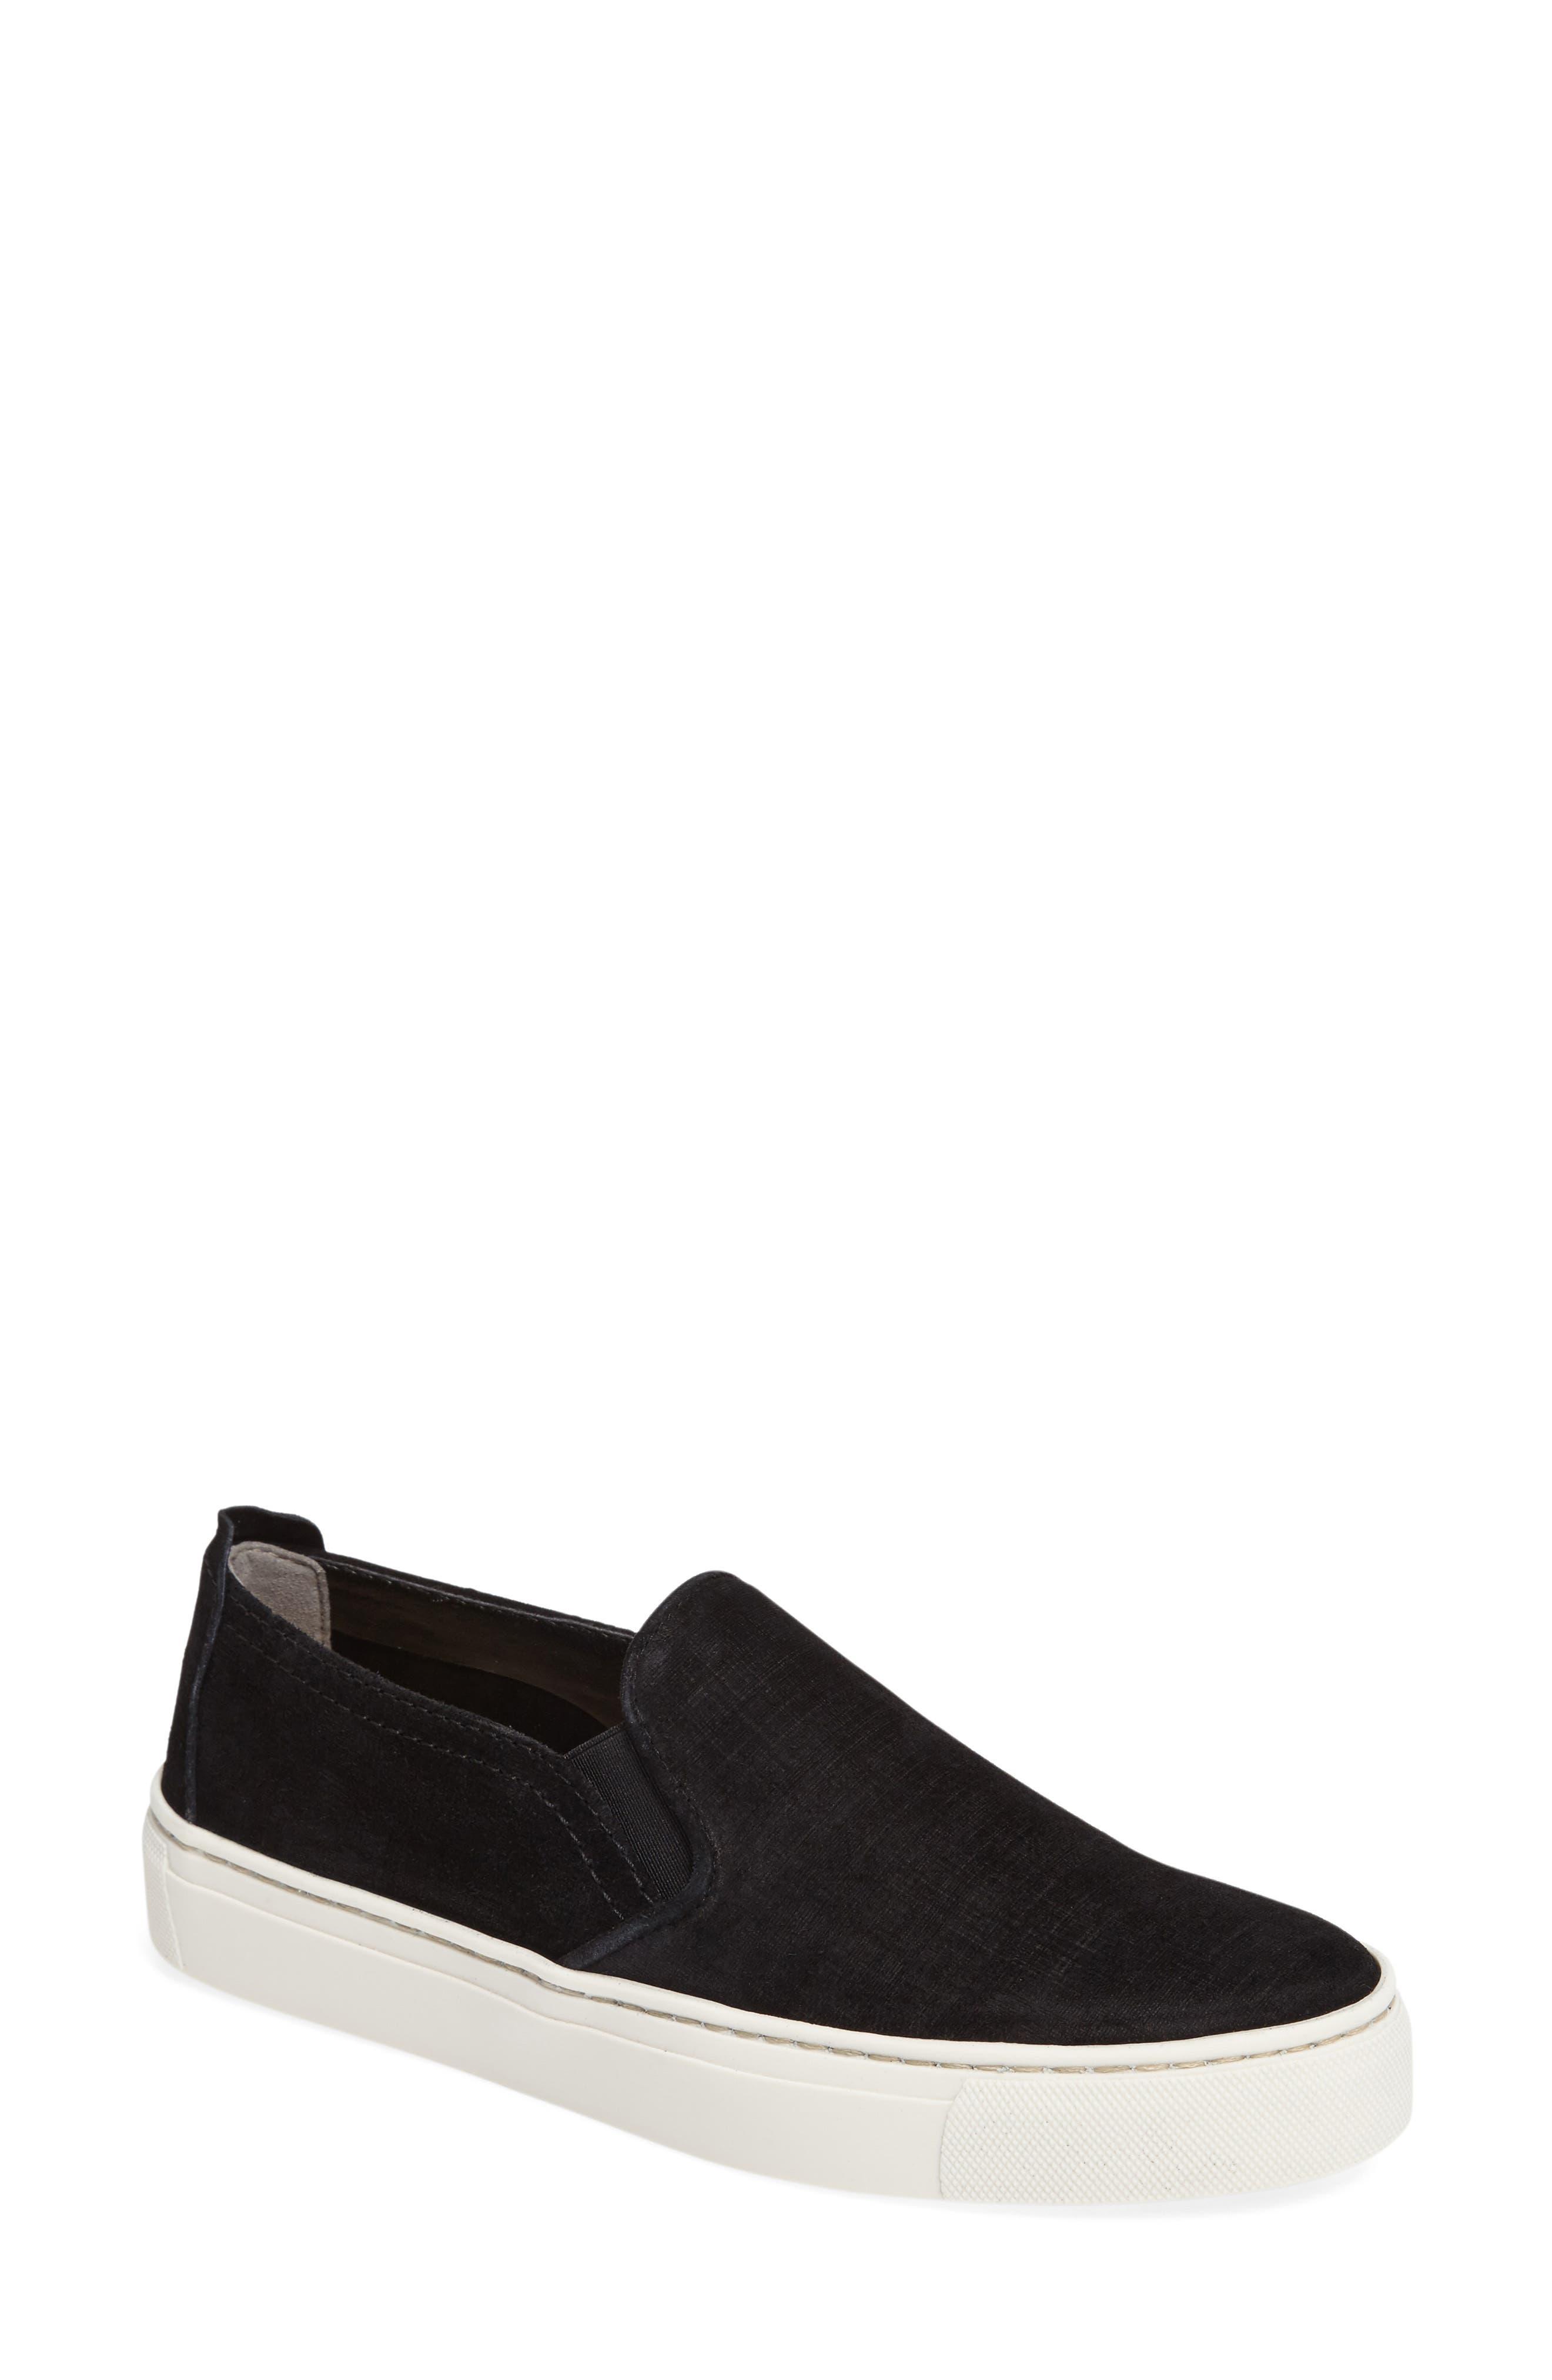 'Sneak Name' Sneaker,                             Main thumbnail 1, color,                             Black